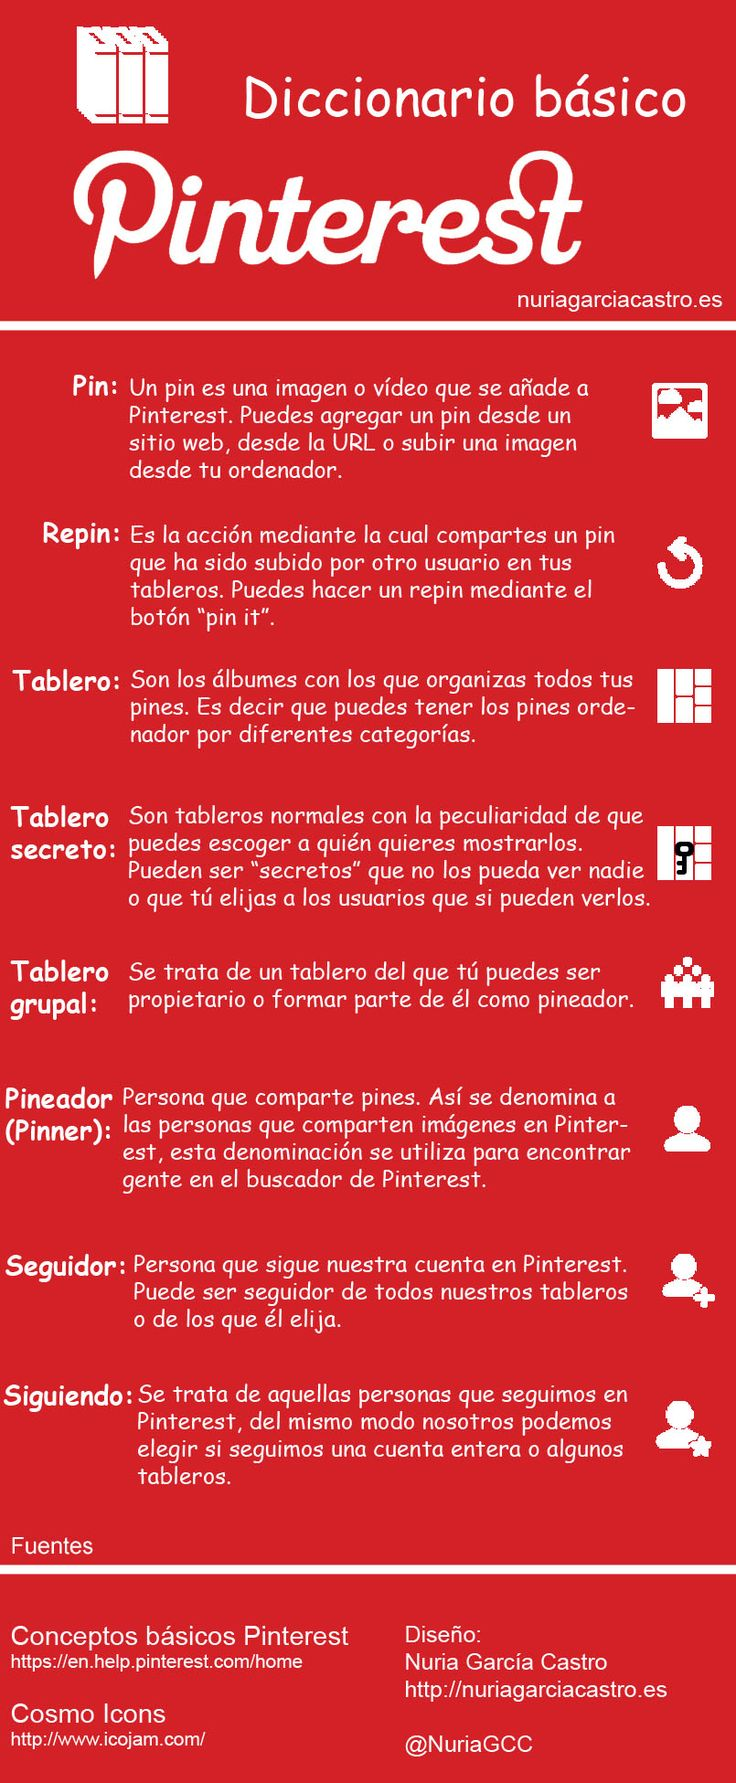 Diccionario básico de Pinterest #infografia